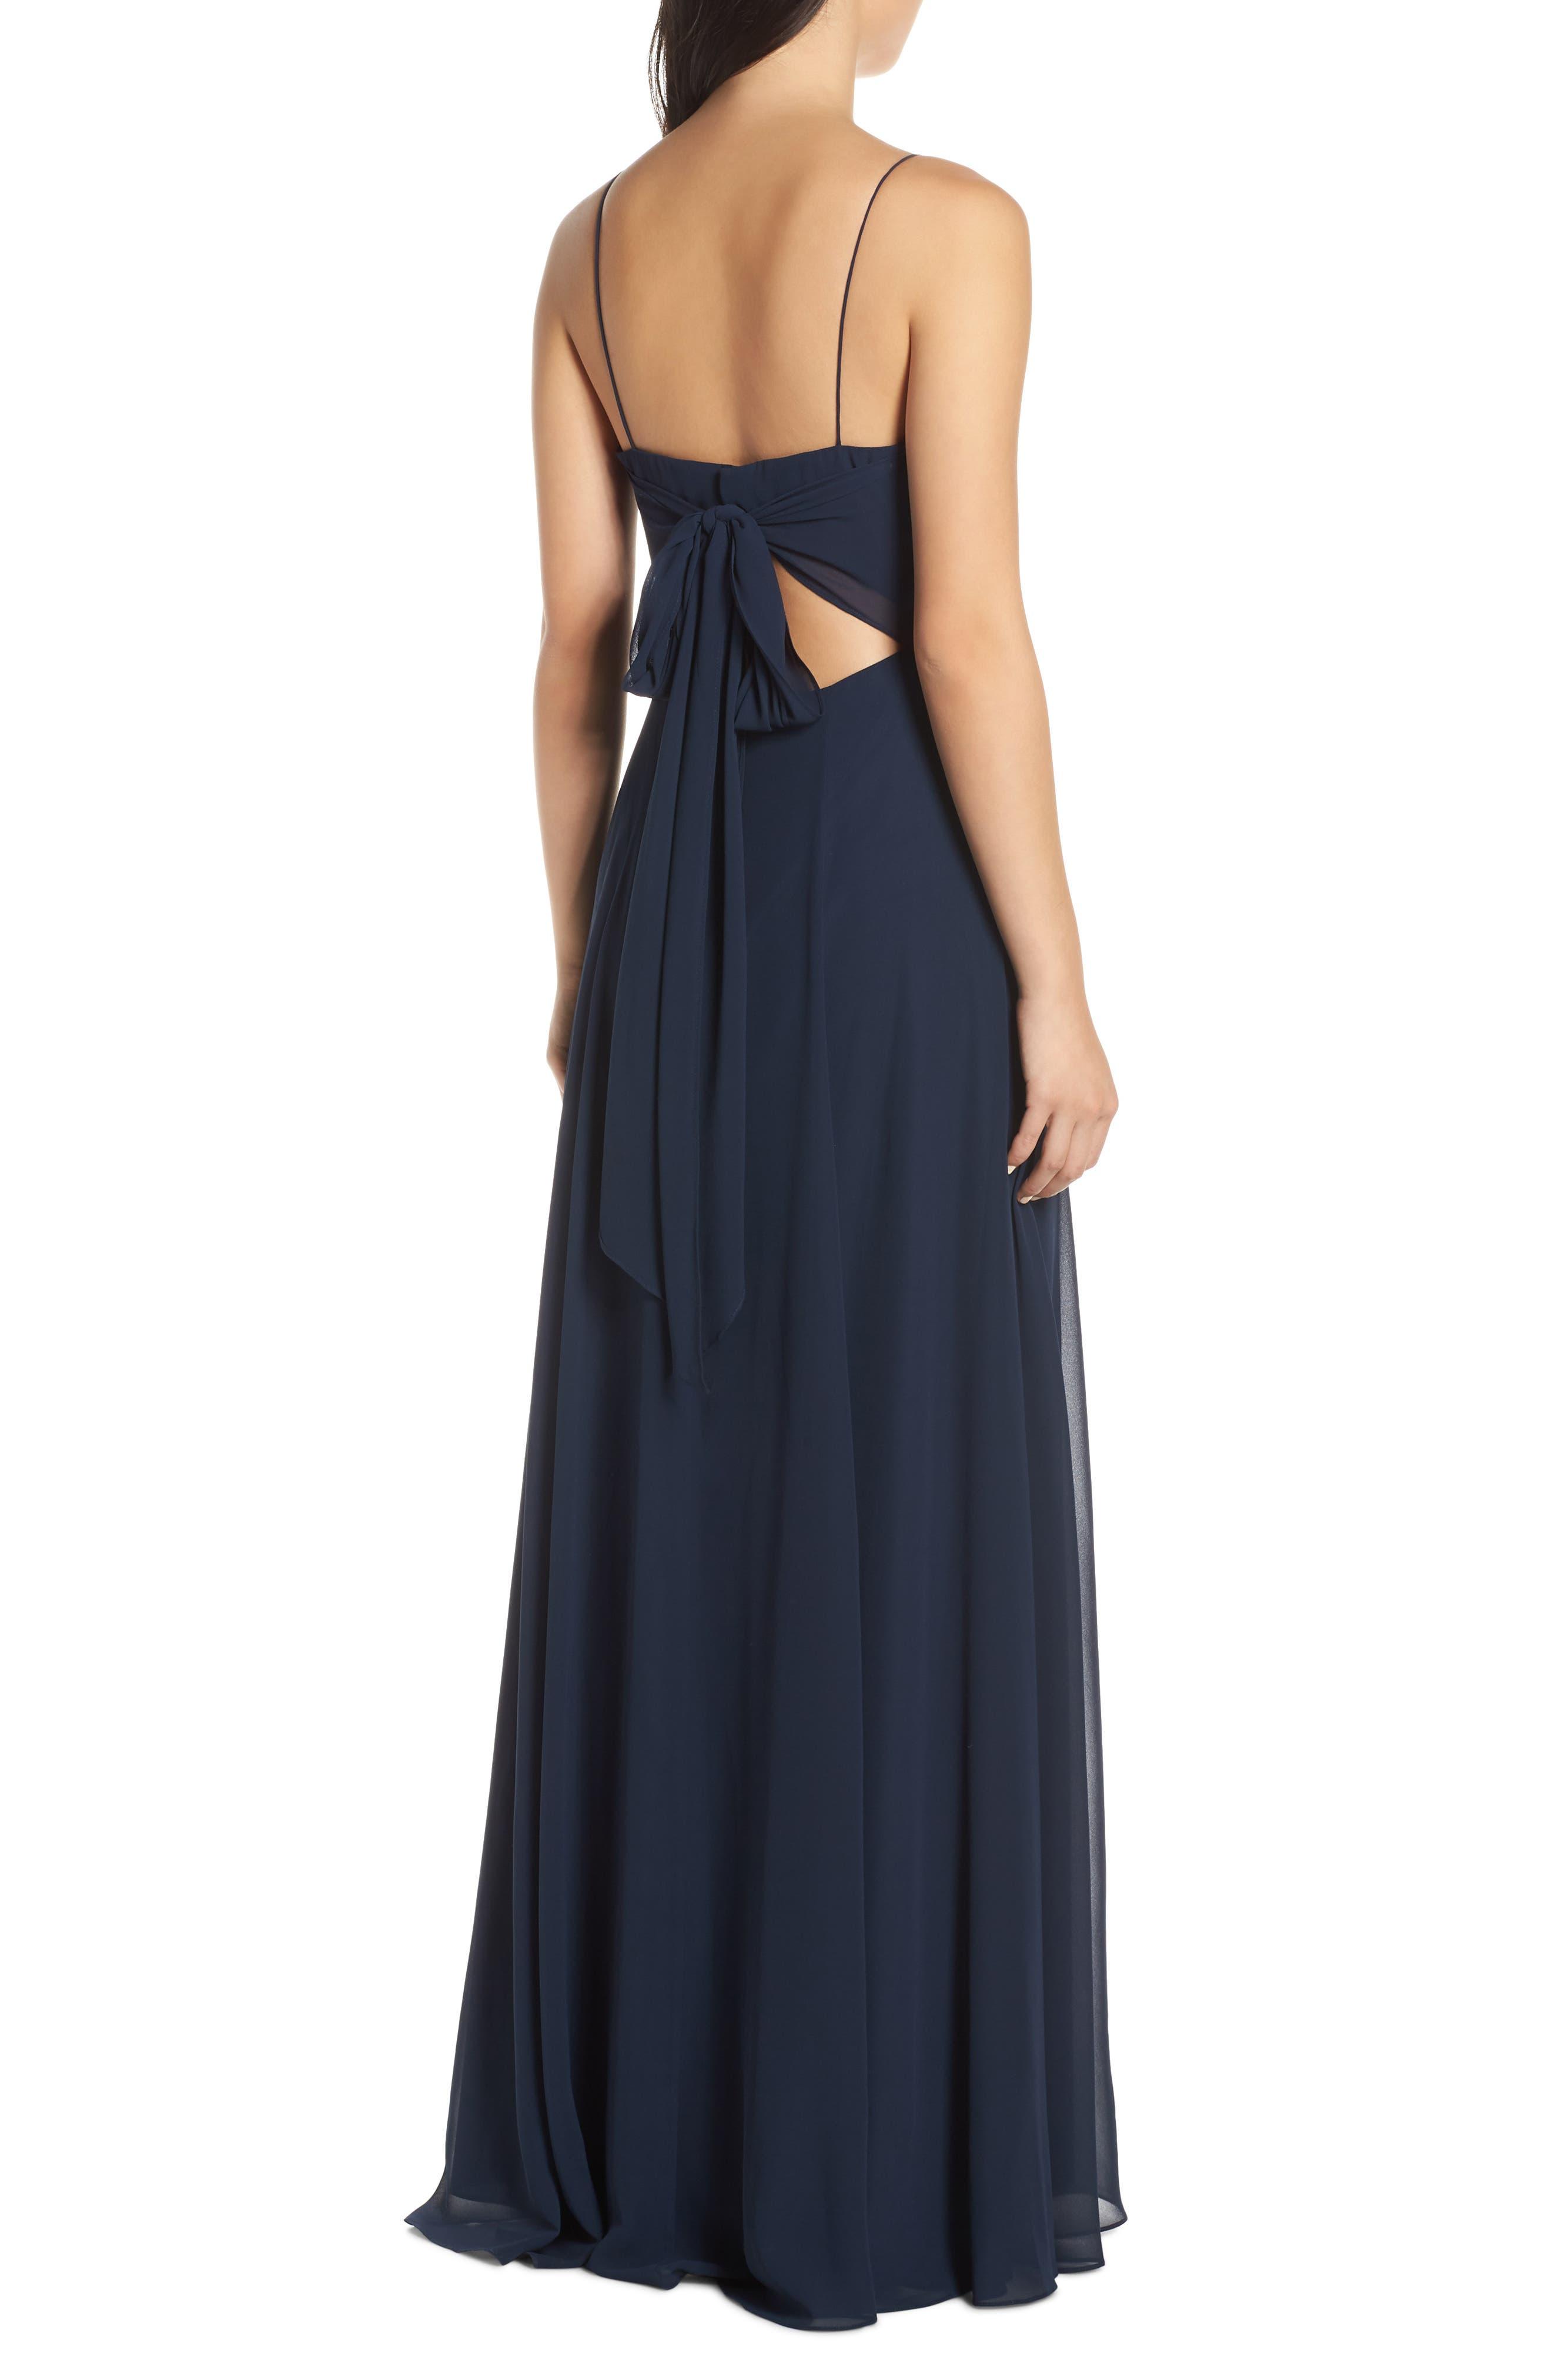 Kiara Bow Back Chiffon Evening Dress,                             Alternate thumbnail 2, color,                             NAVY